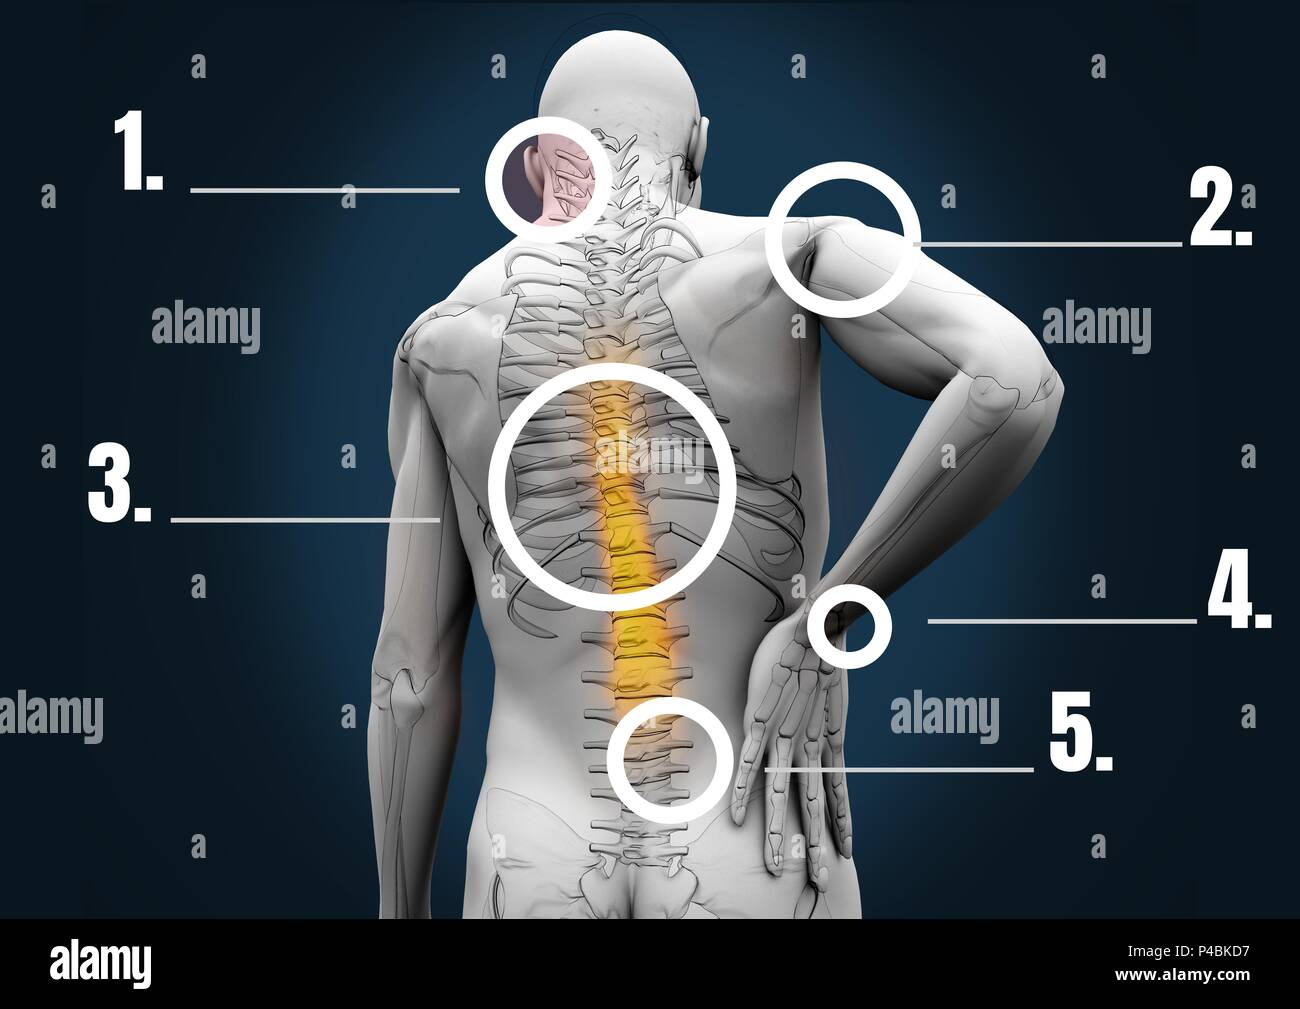 Human Bone Structure Imágenes De Stock & Human Bone Structure Fotos ...